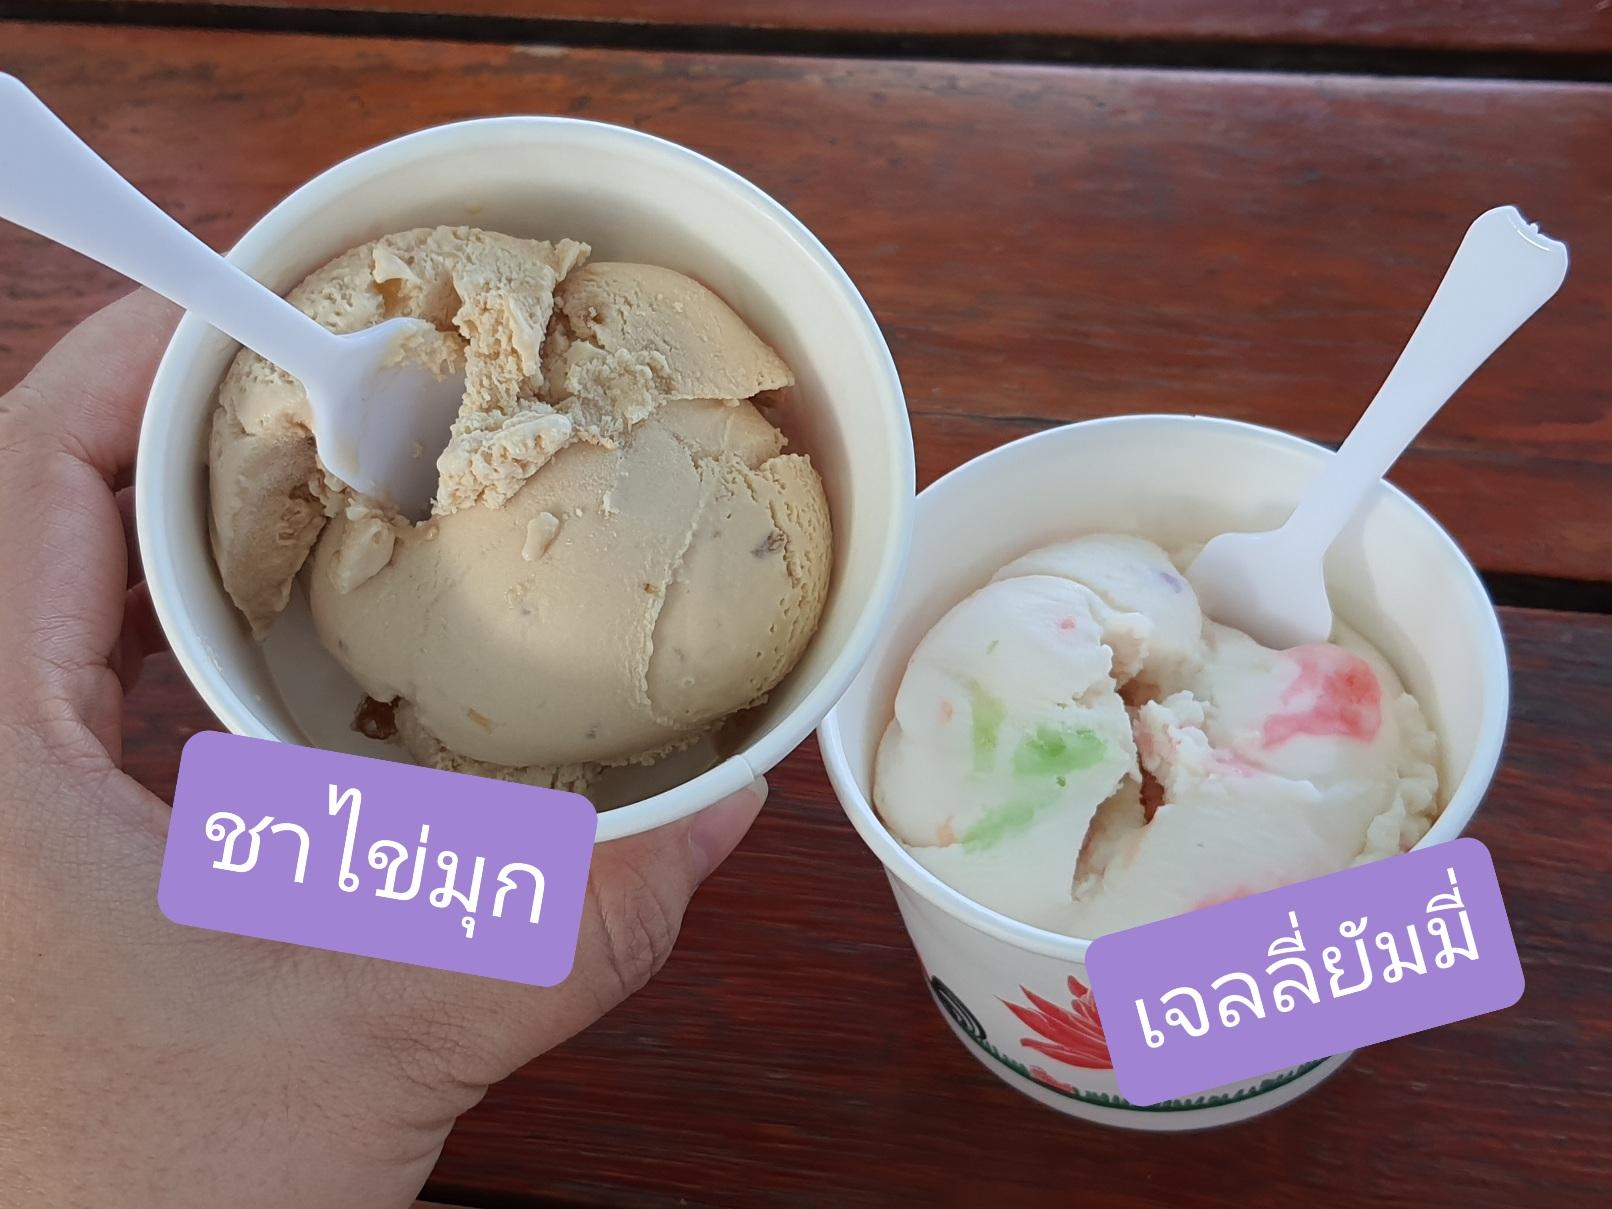 Craft Home ร้านอาหารนานาชาติ ฟิวชั่น ขนมหวาน และคราฟท์เบียร์ @ พระราม 2 ซอย 33 ( วัดยายร่ม) รีวิว Review Pantip wongnai